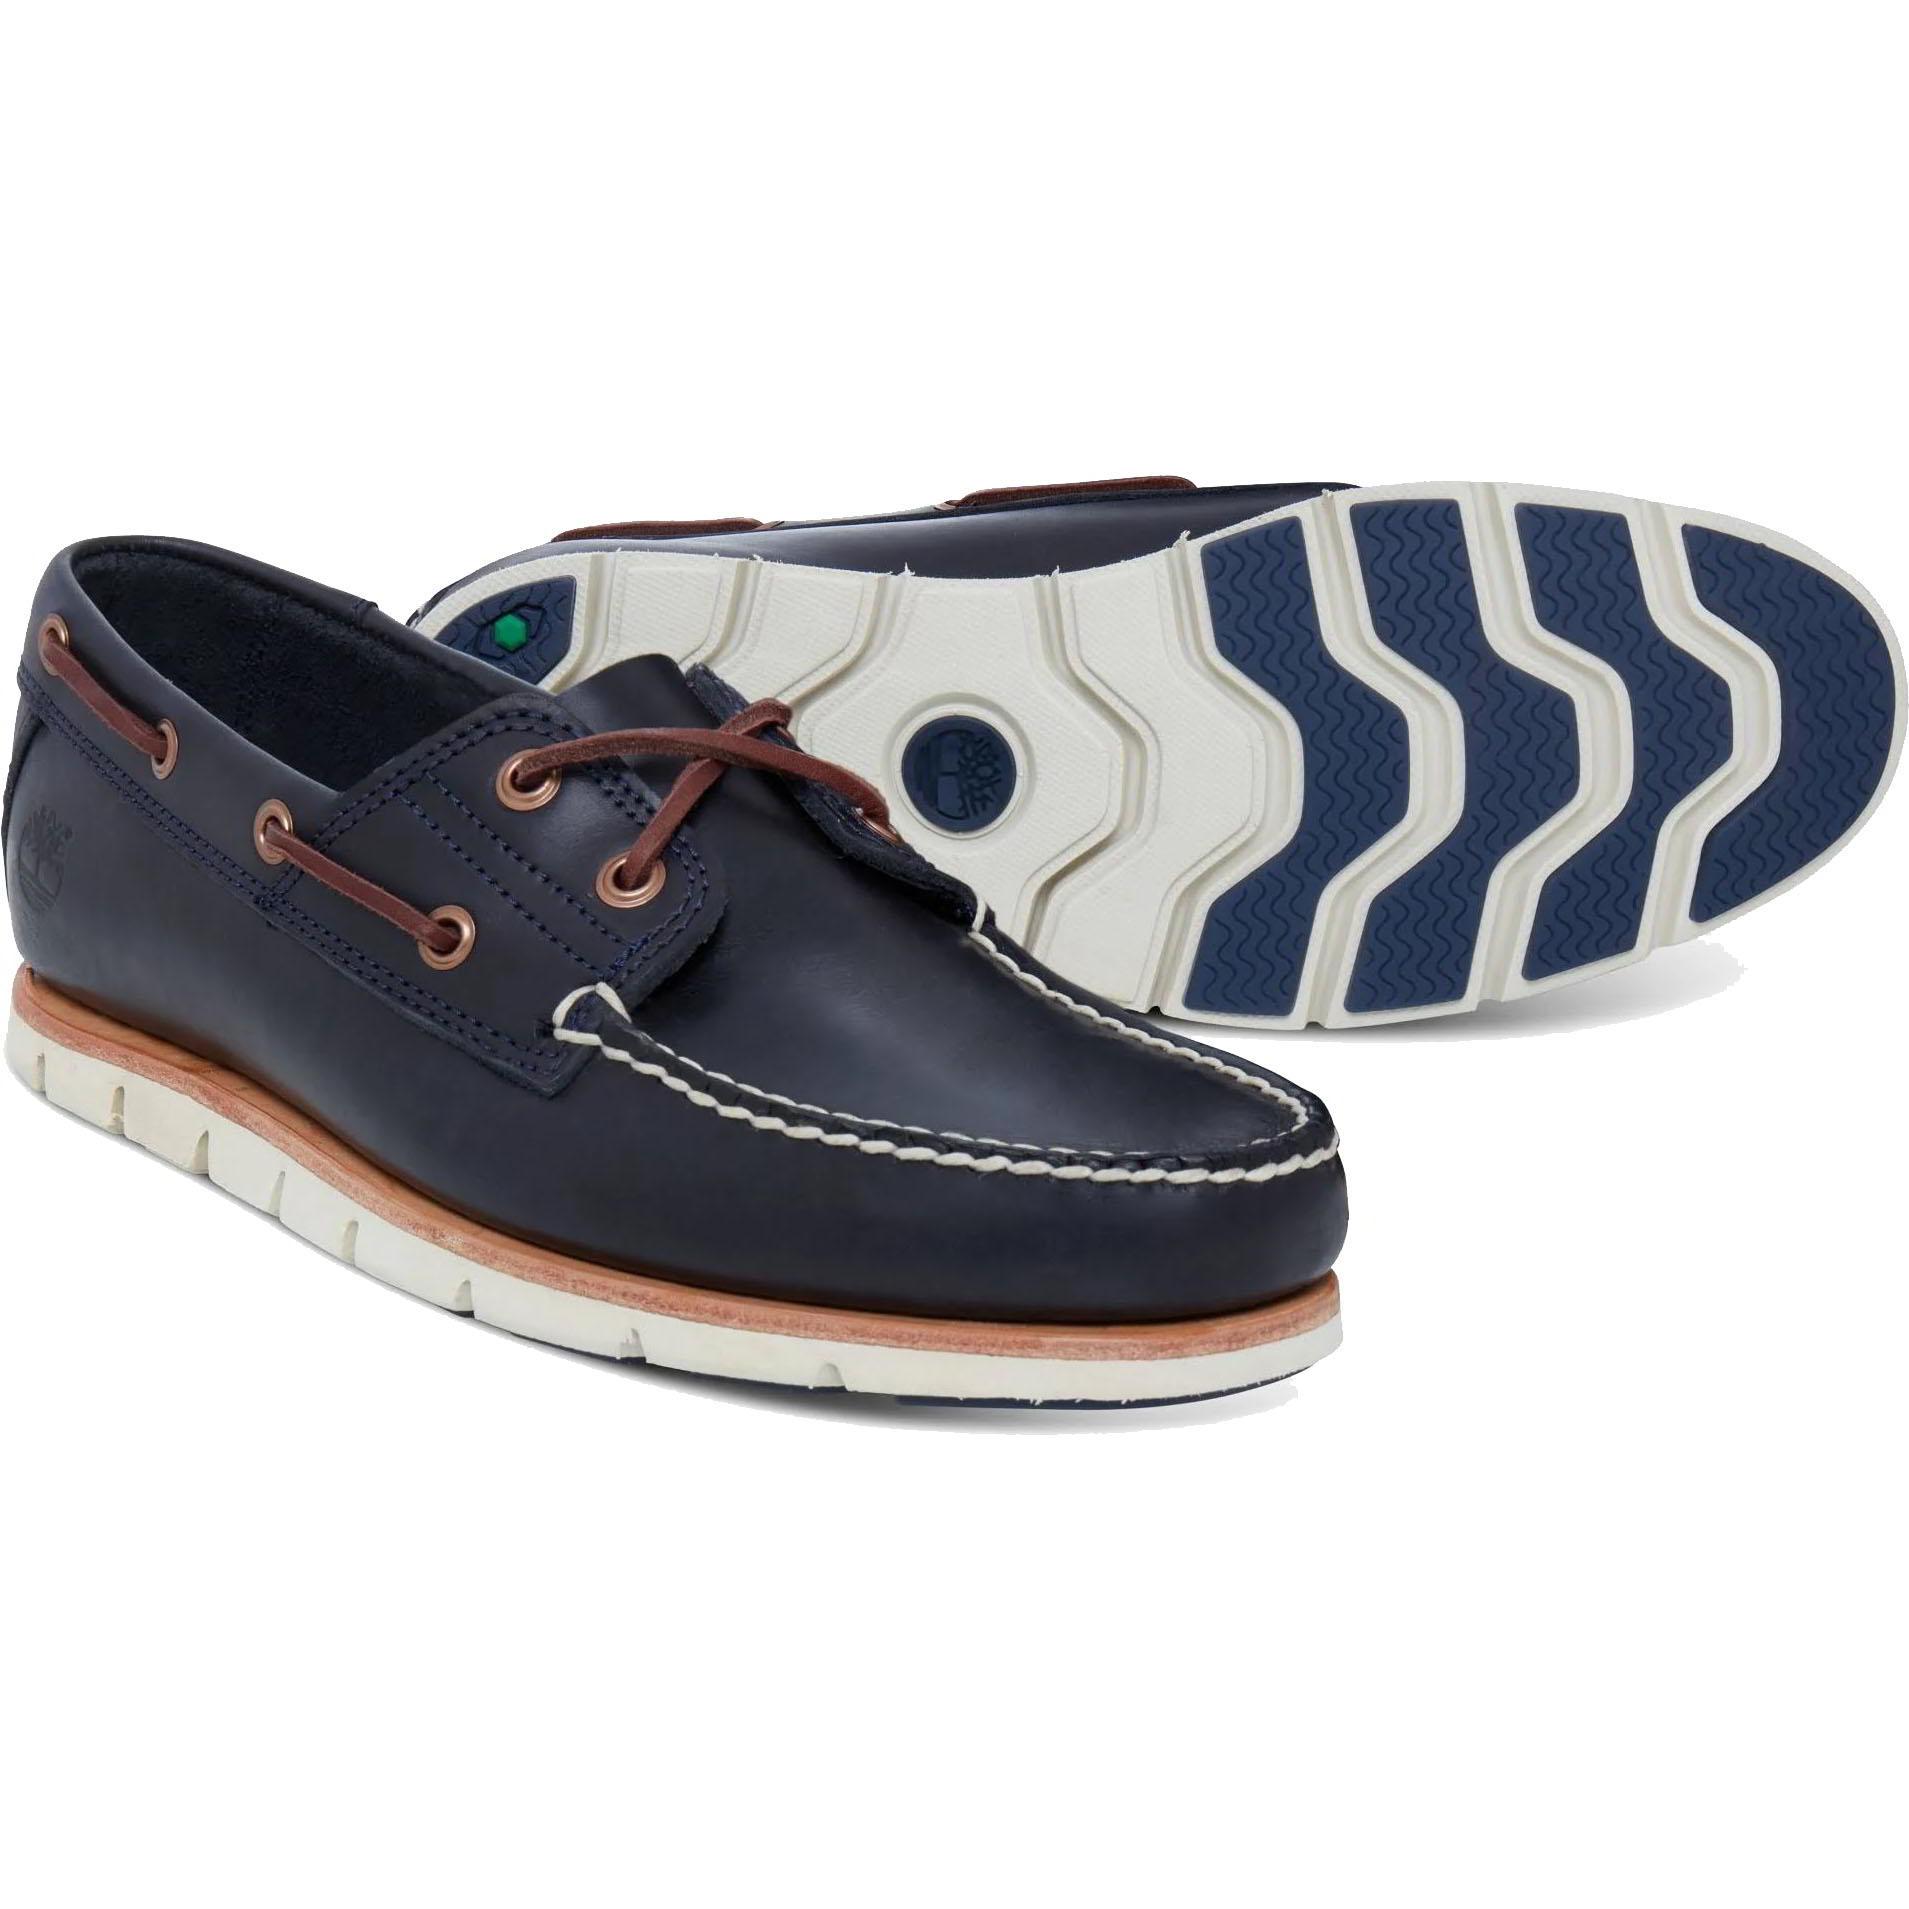 Timberland Mens Tidelands Boat Deck Shoes - Navy - A1BBU